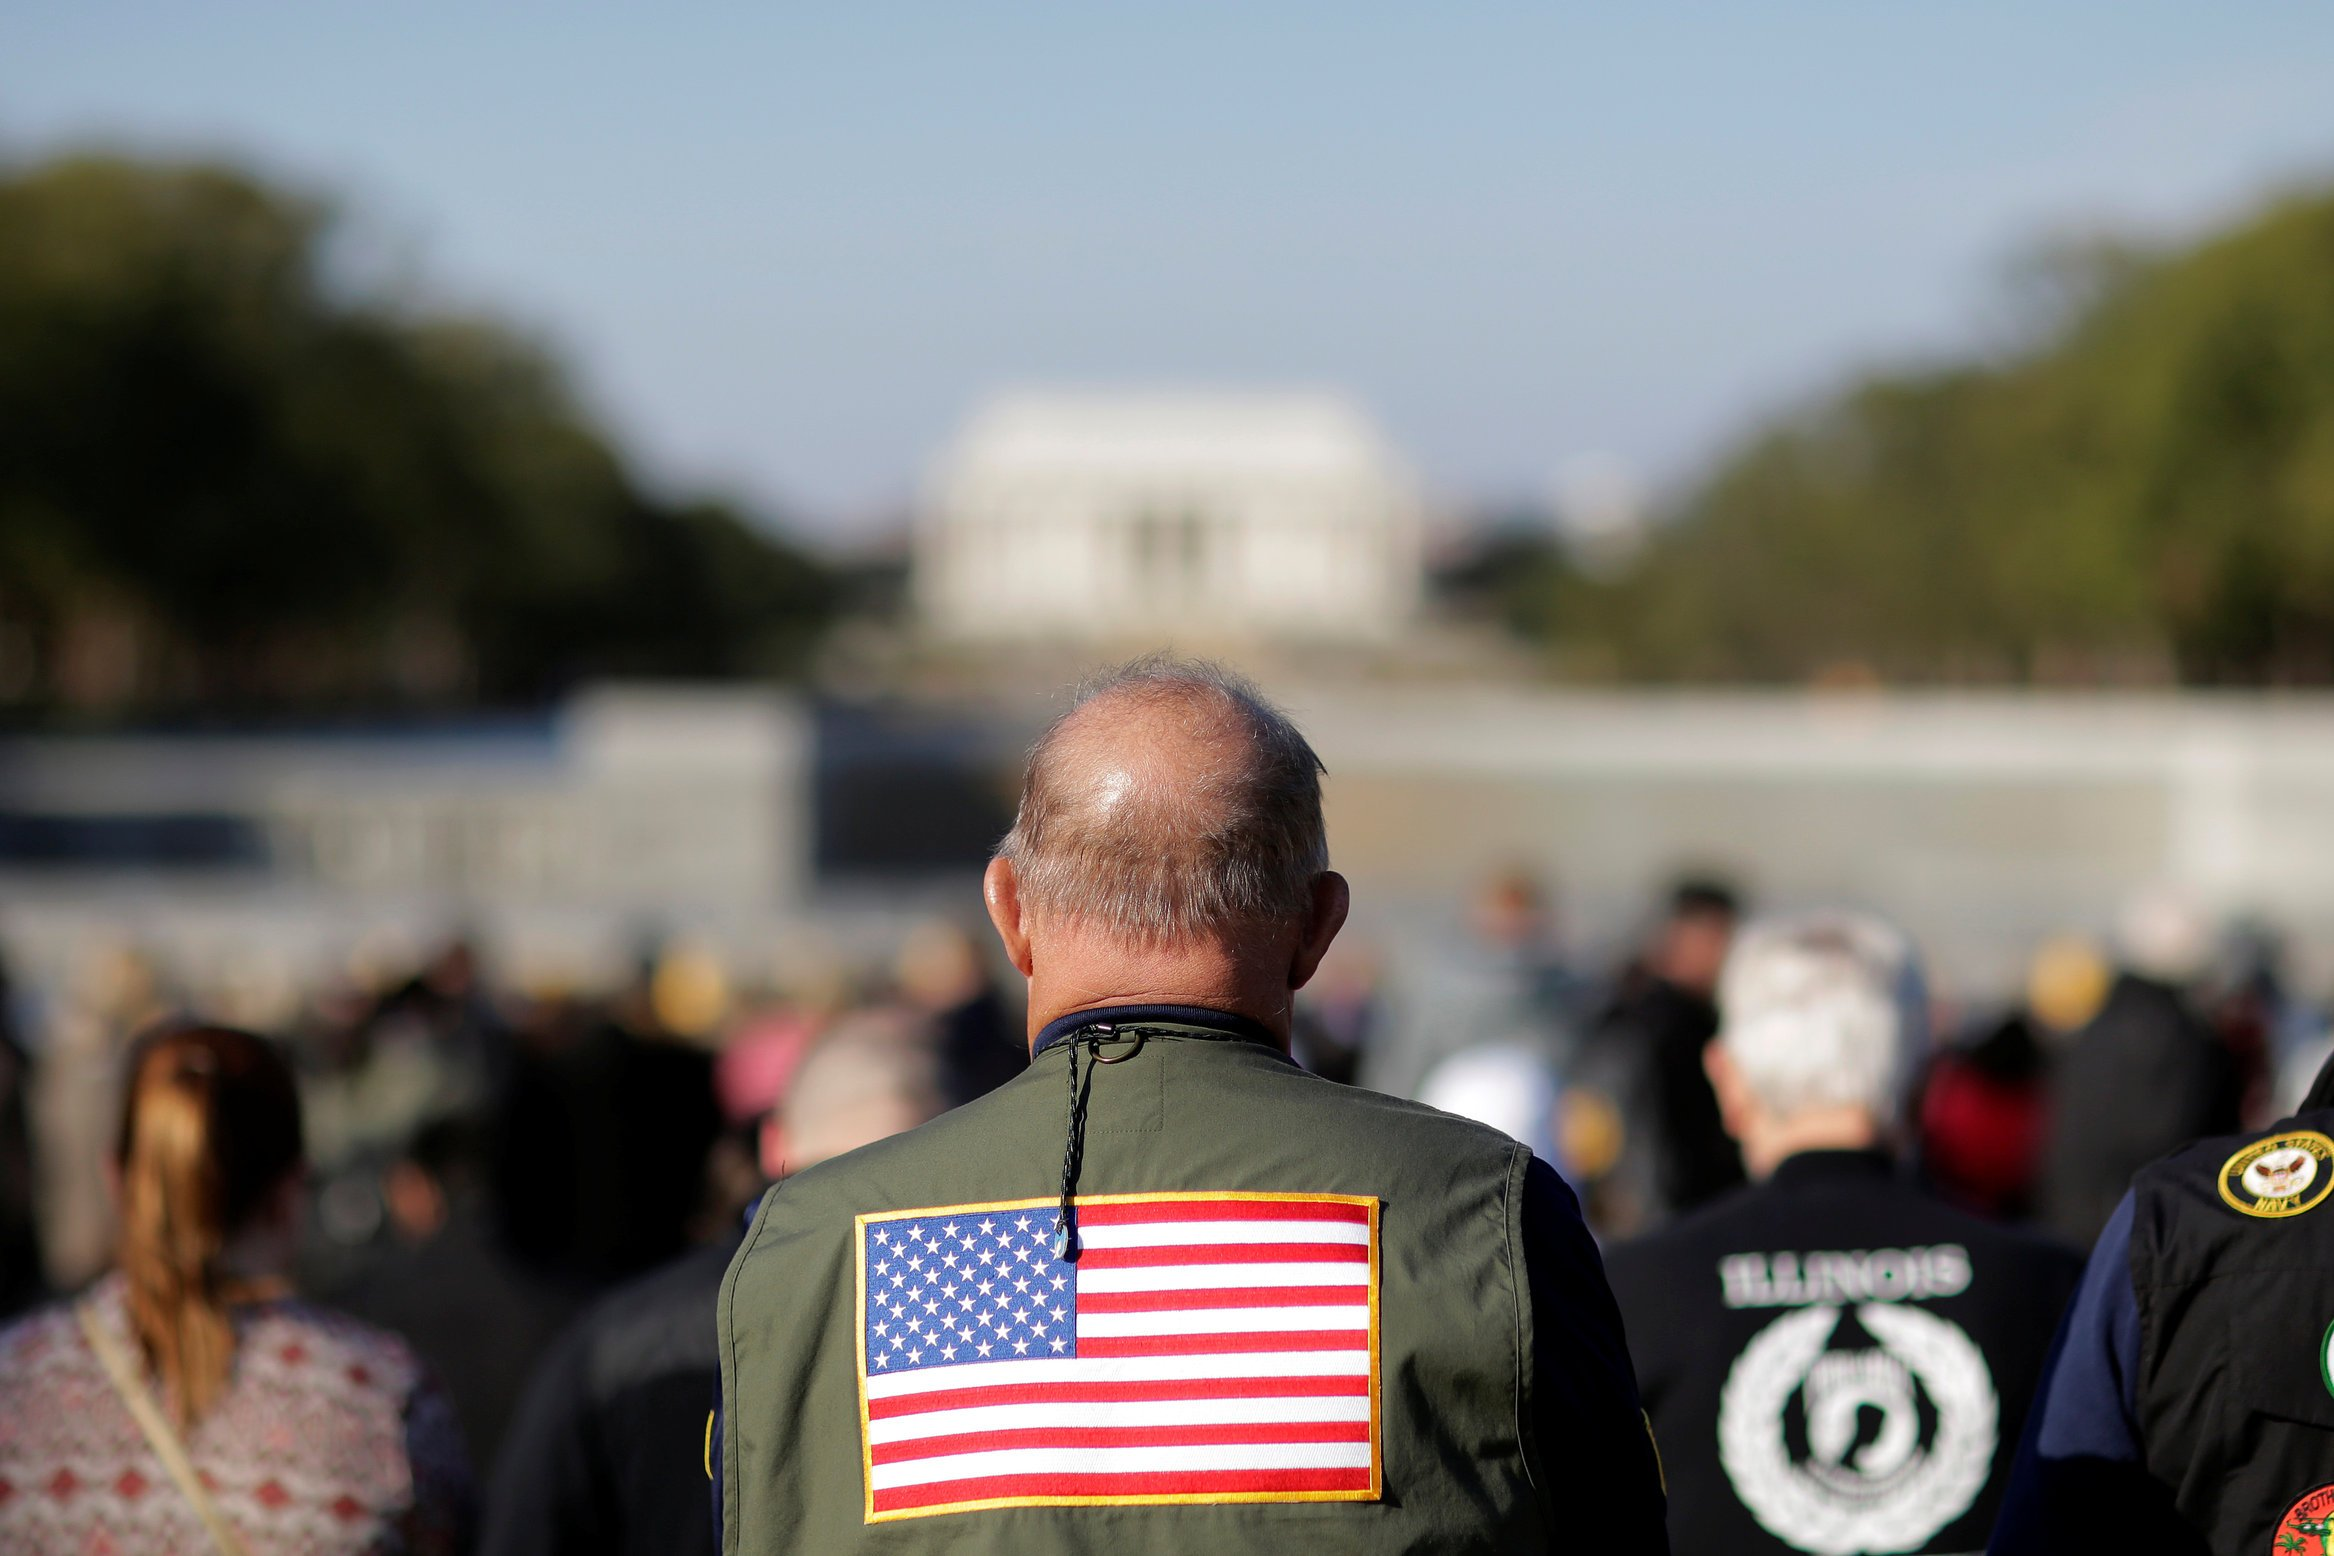 Veterans attend Memorial day services at the World War II Memorial in Washington, U.S., November 11, 2016. REUTERS/Joshua Roberts